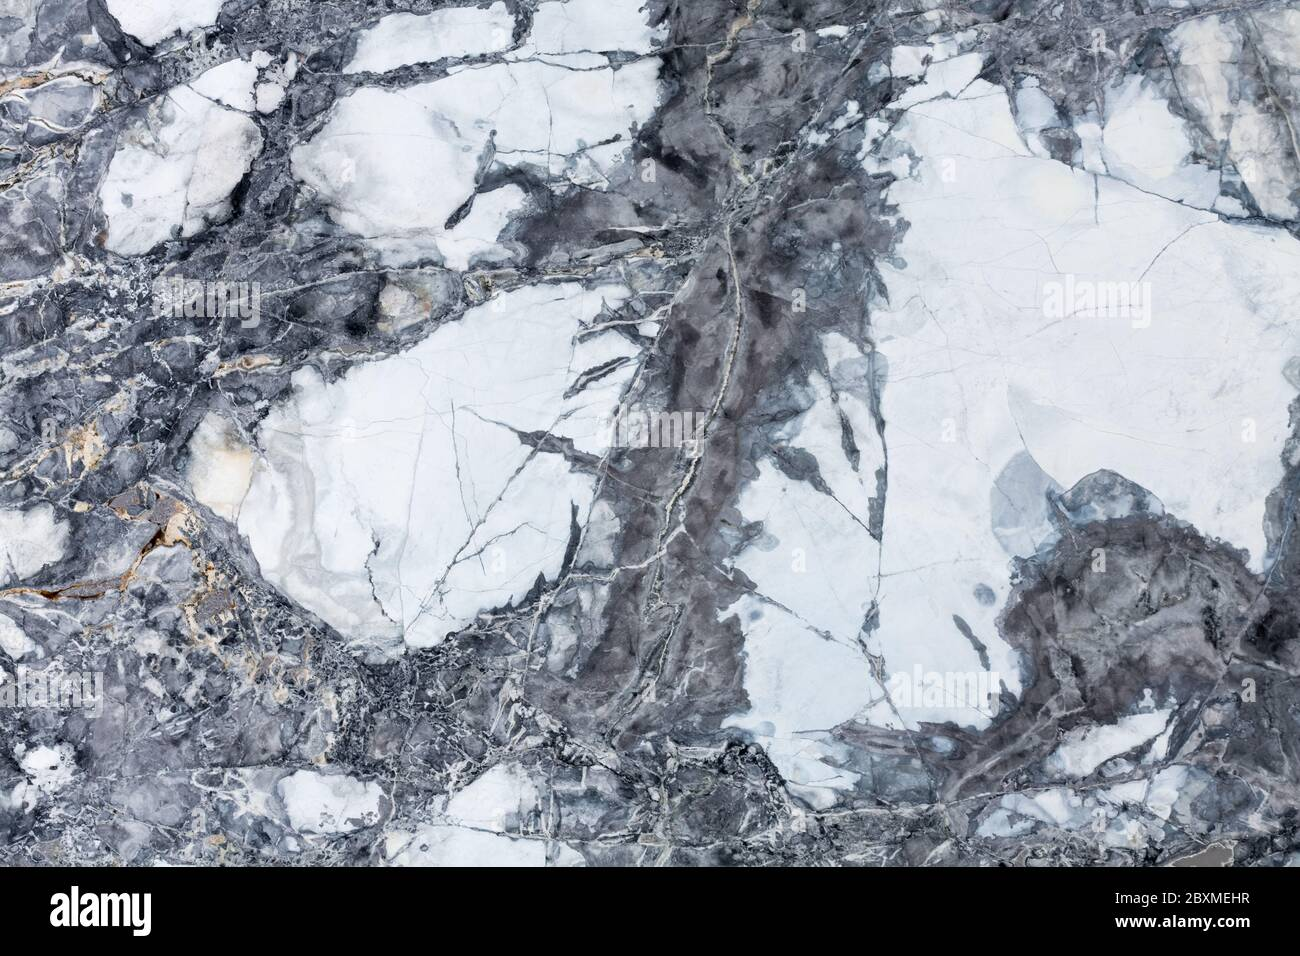 Dark Grey Marble Texture Marble Wallpaper Background Texture Stock Photo Alamy